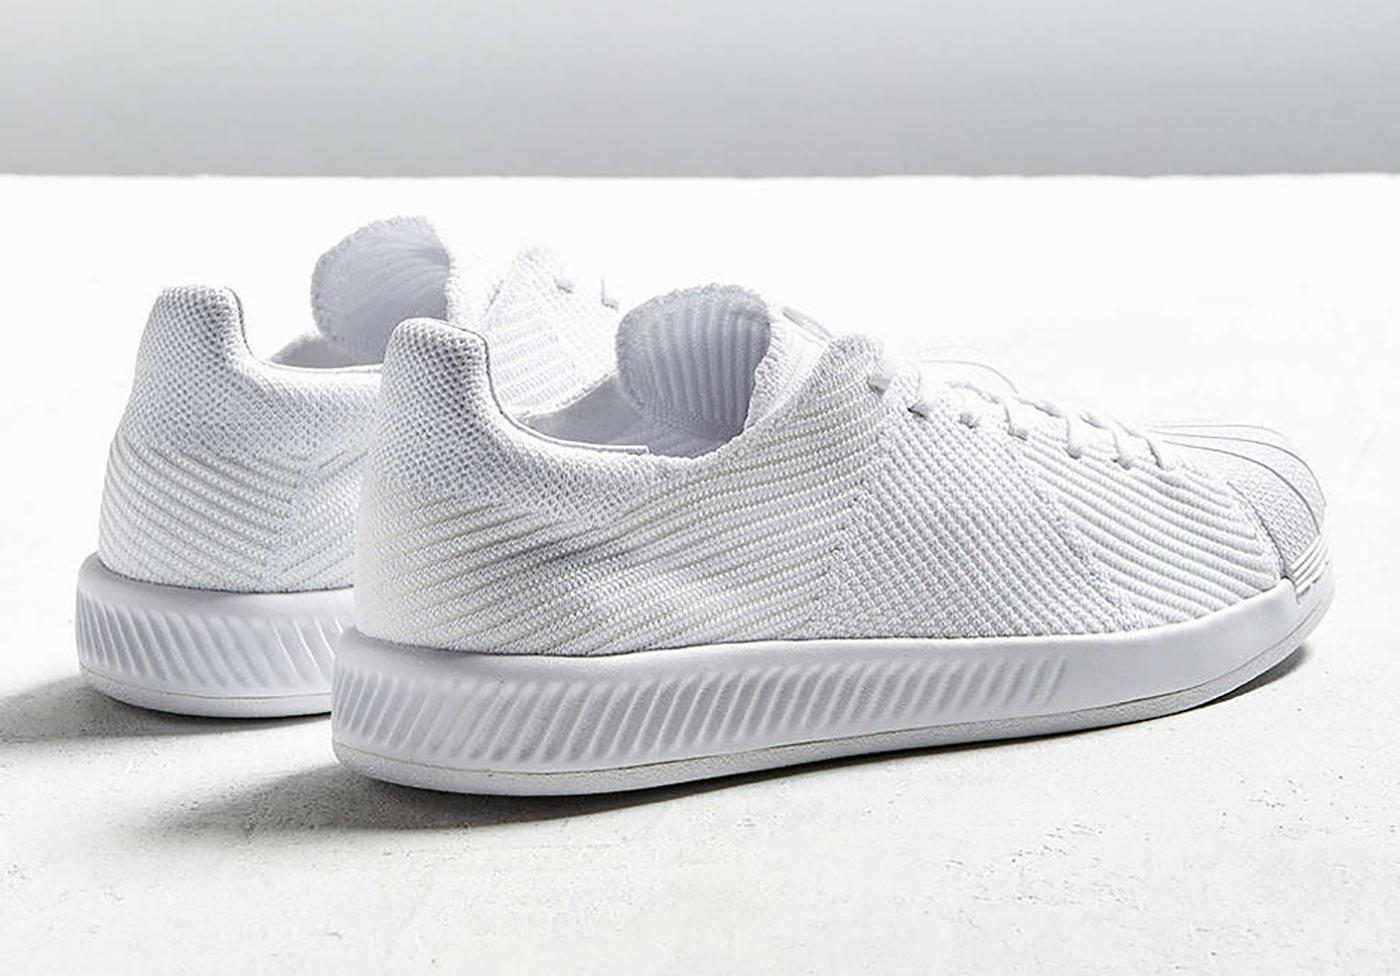 adidas-superstar-primeknit-3